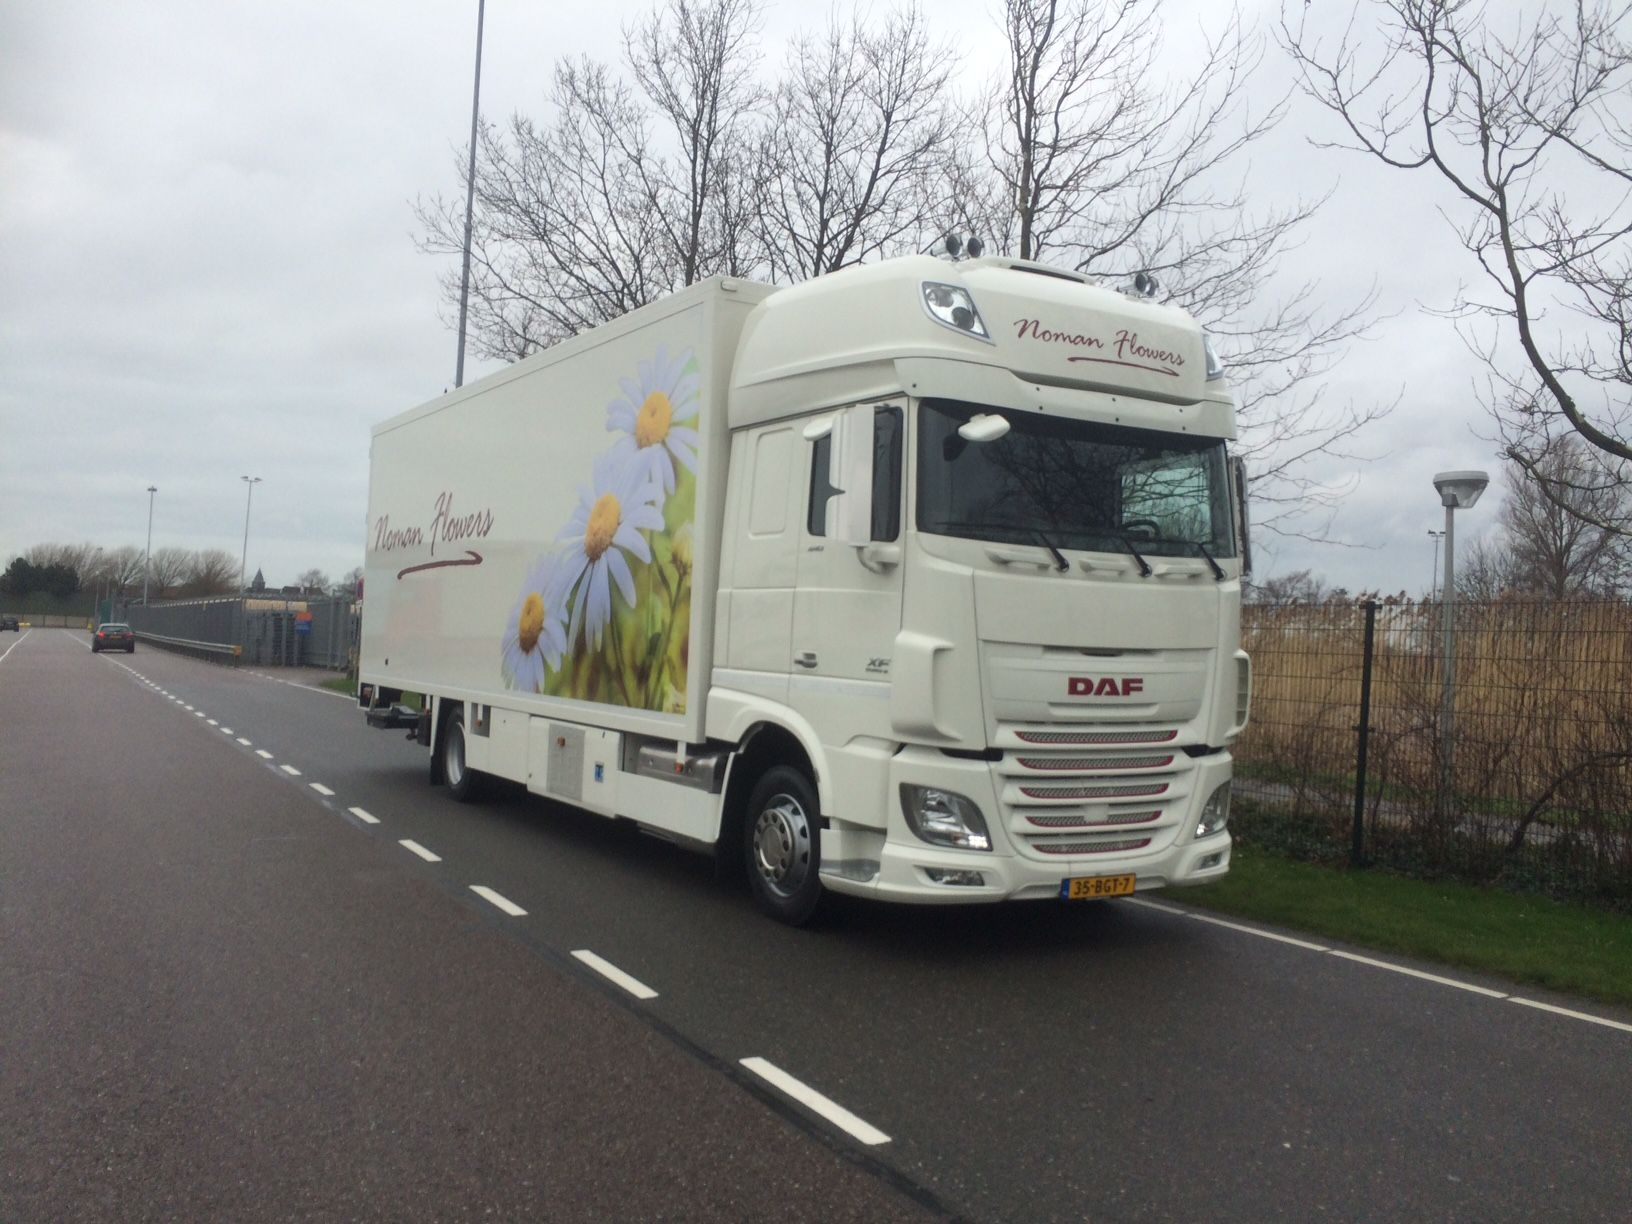 Daf truck recreational vehicles vehicles trucks